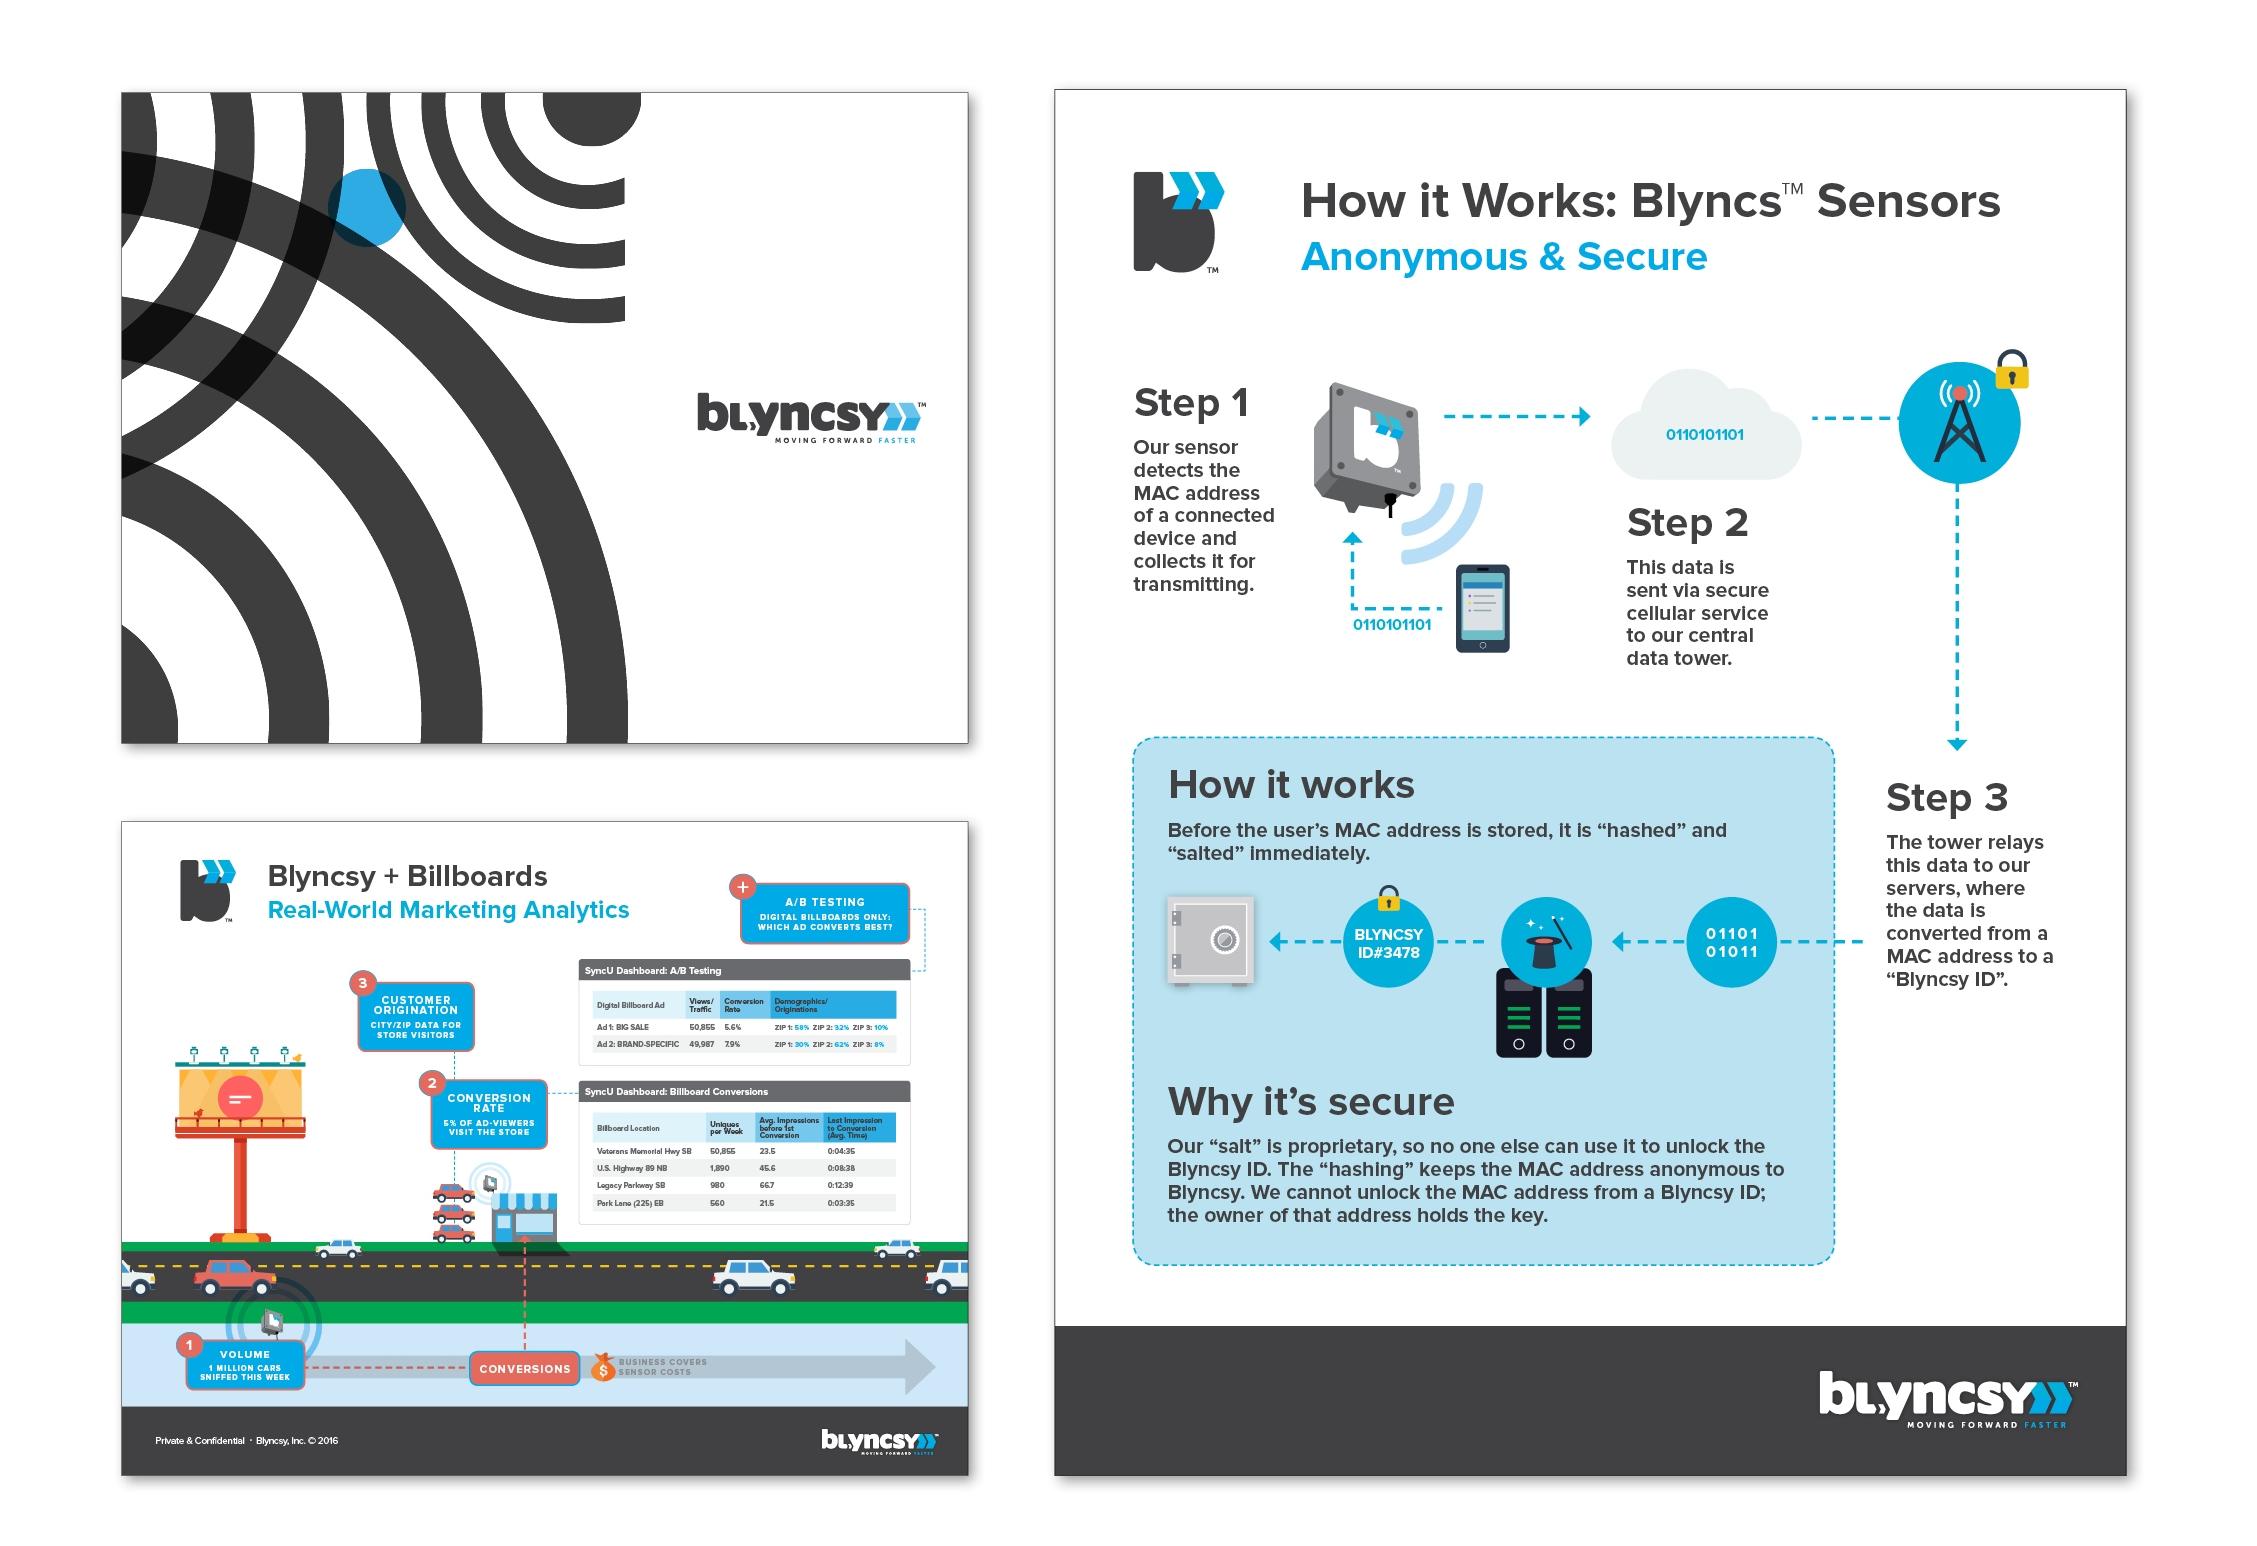 blyncsy presentation materials